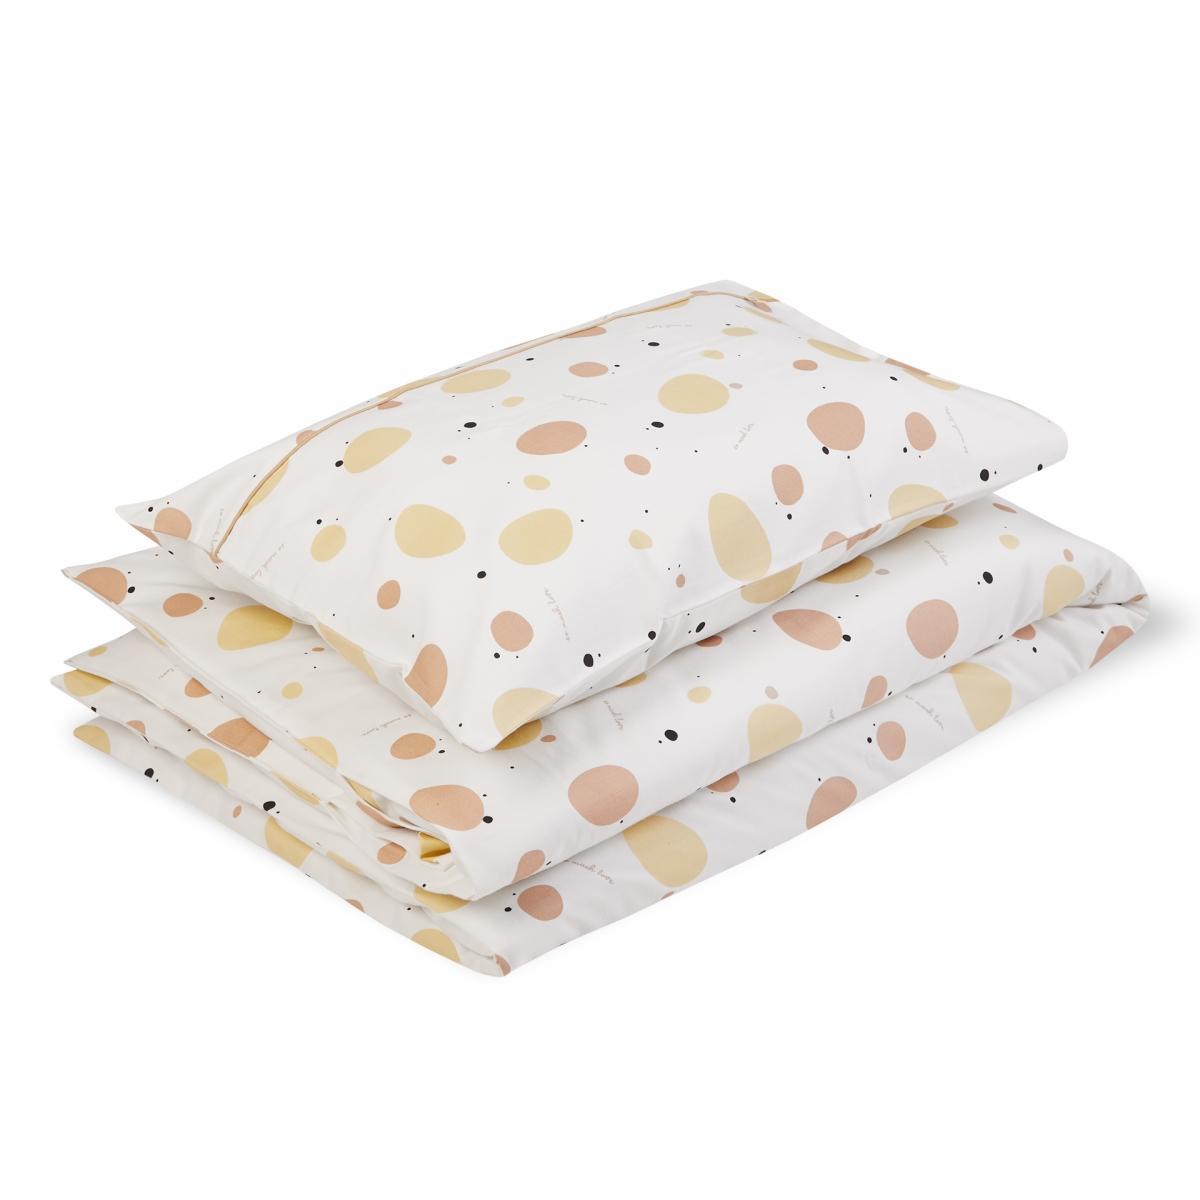 Baby bedding + Duvet